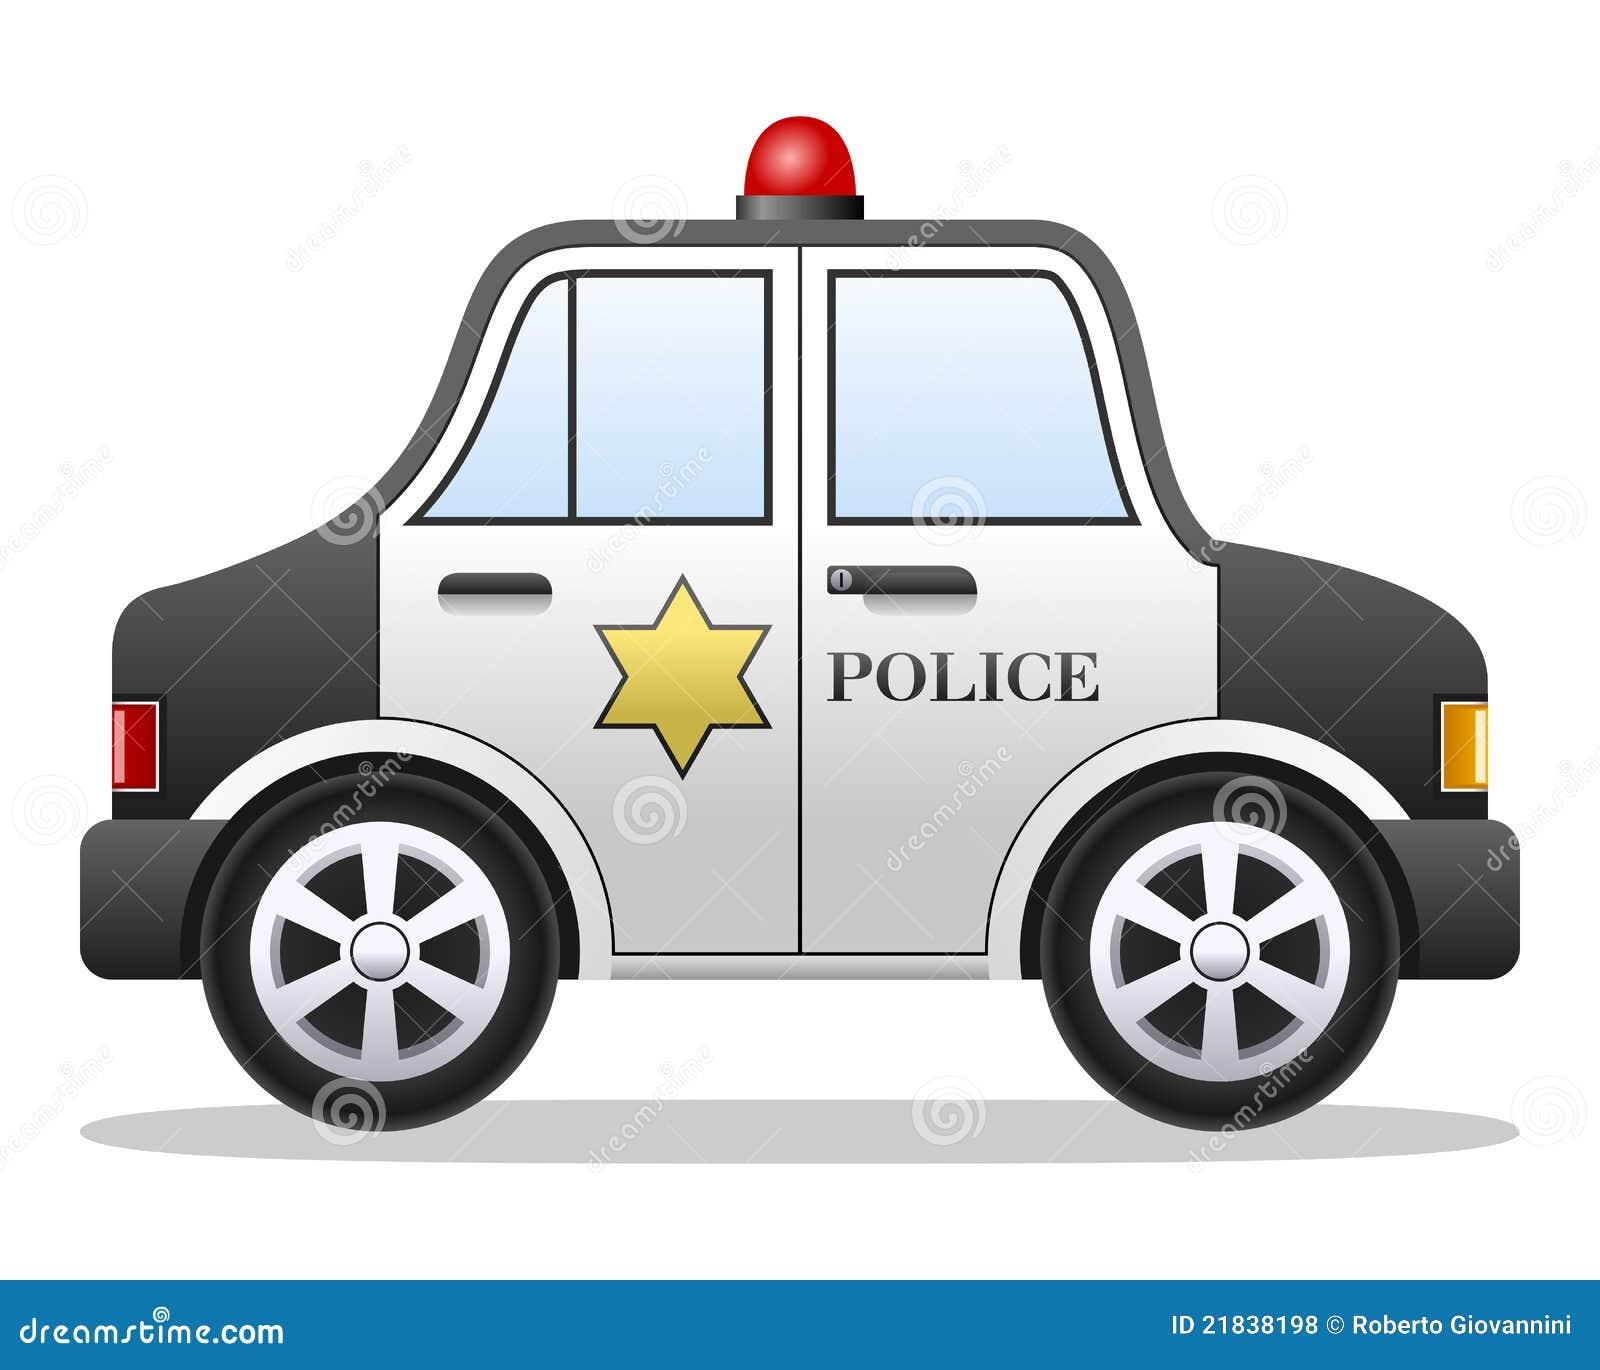 Cartoon Police Car Royalty Free Stock Photos